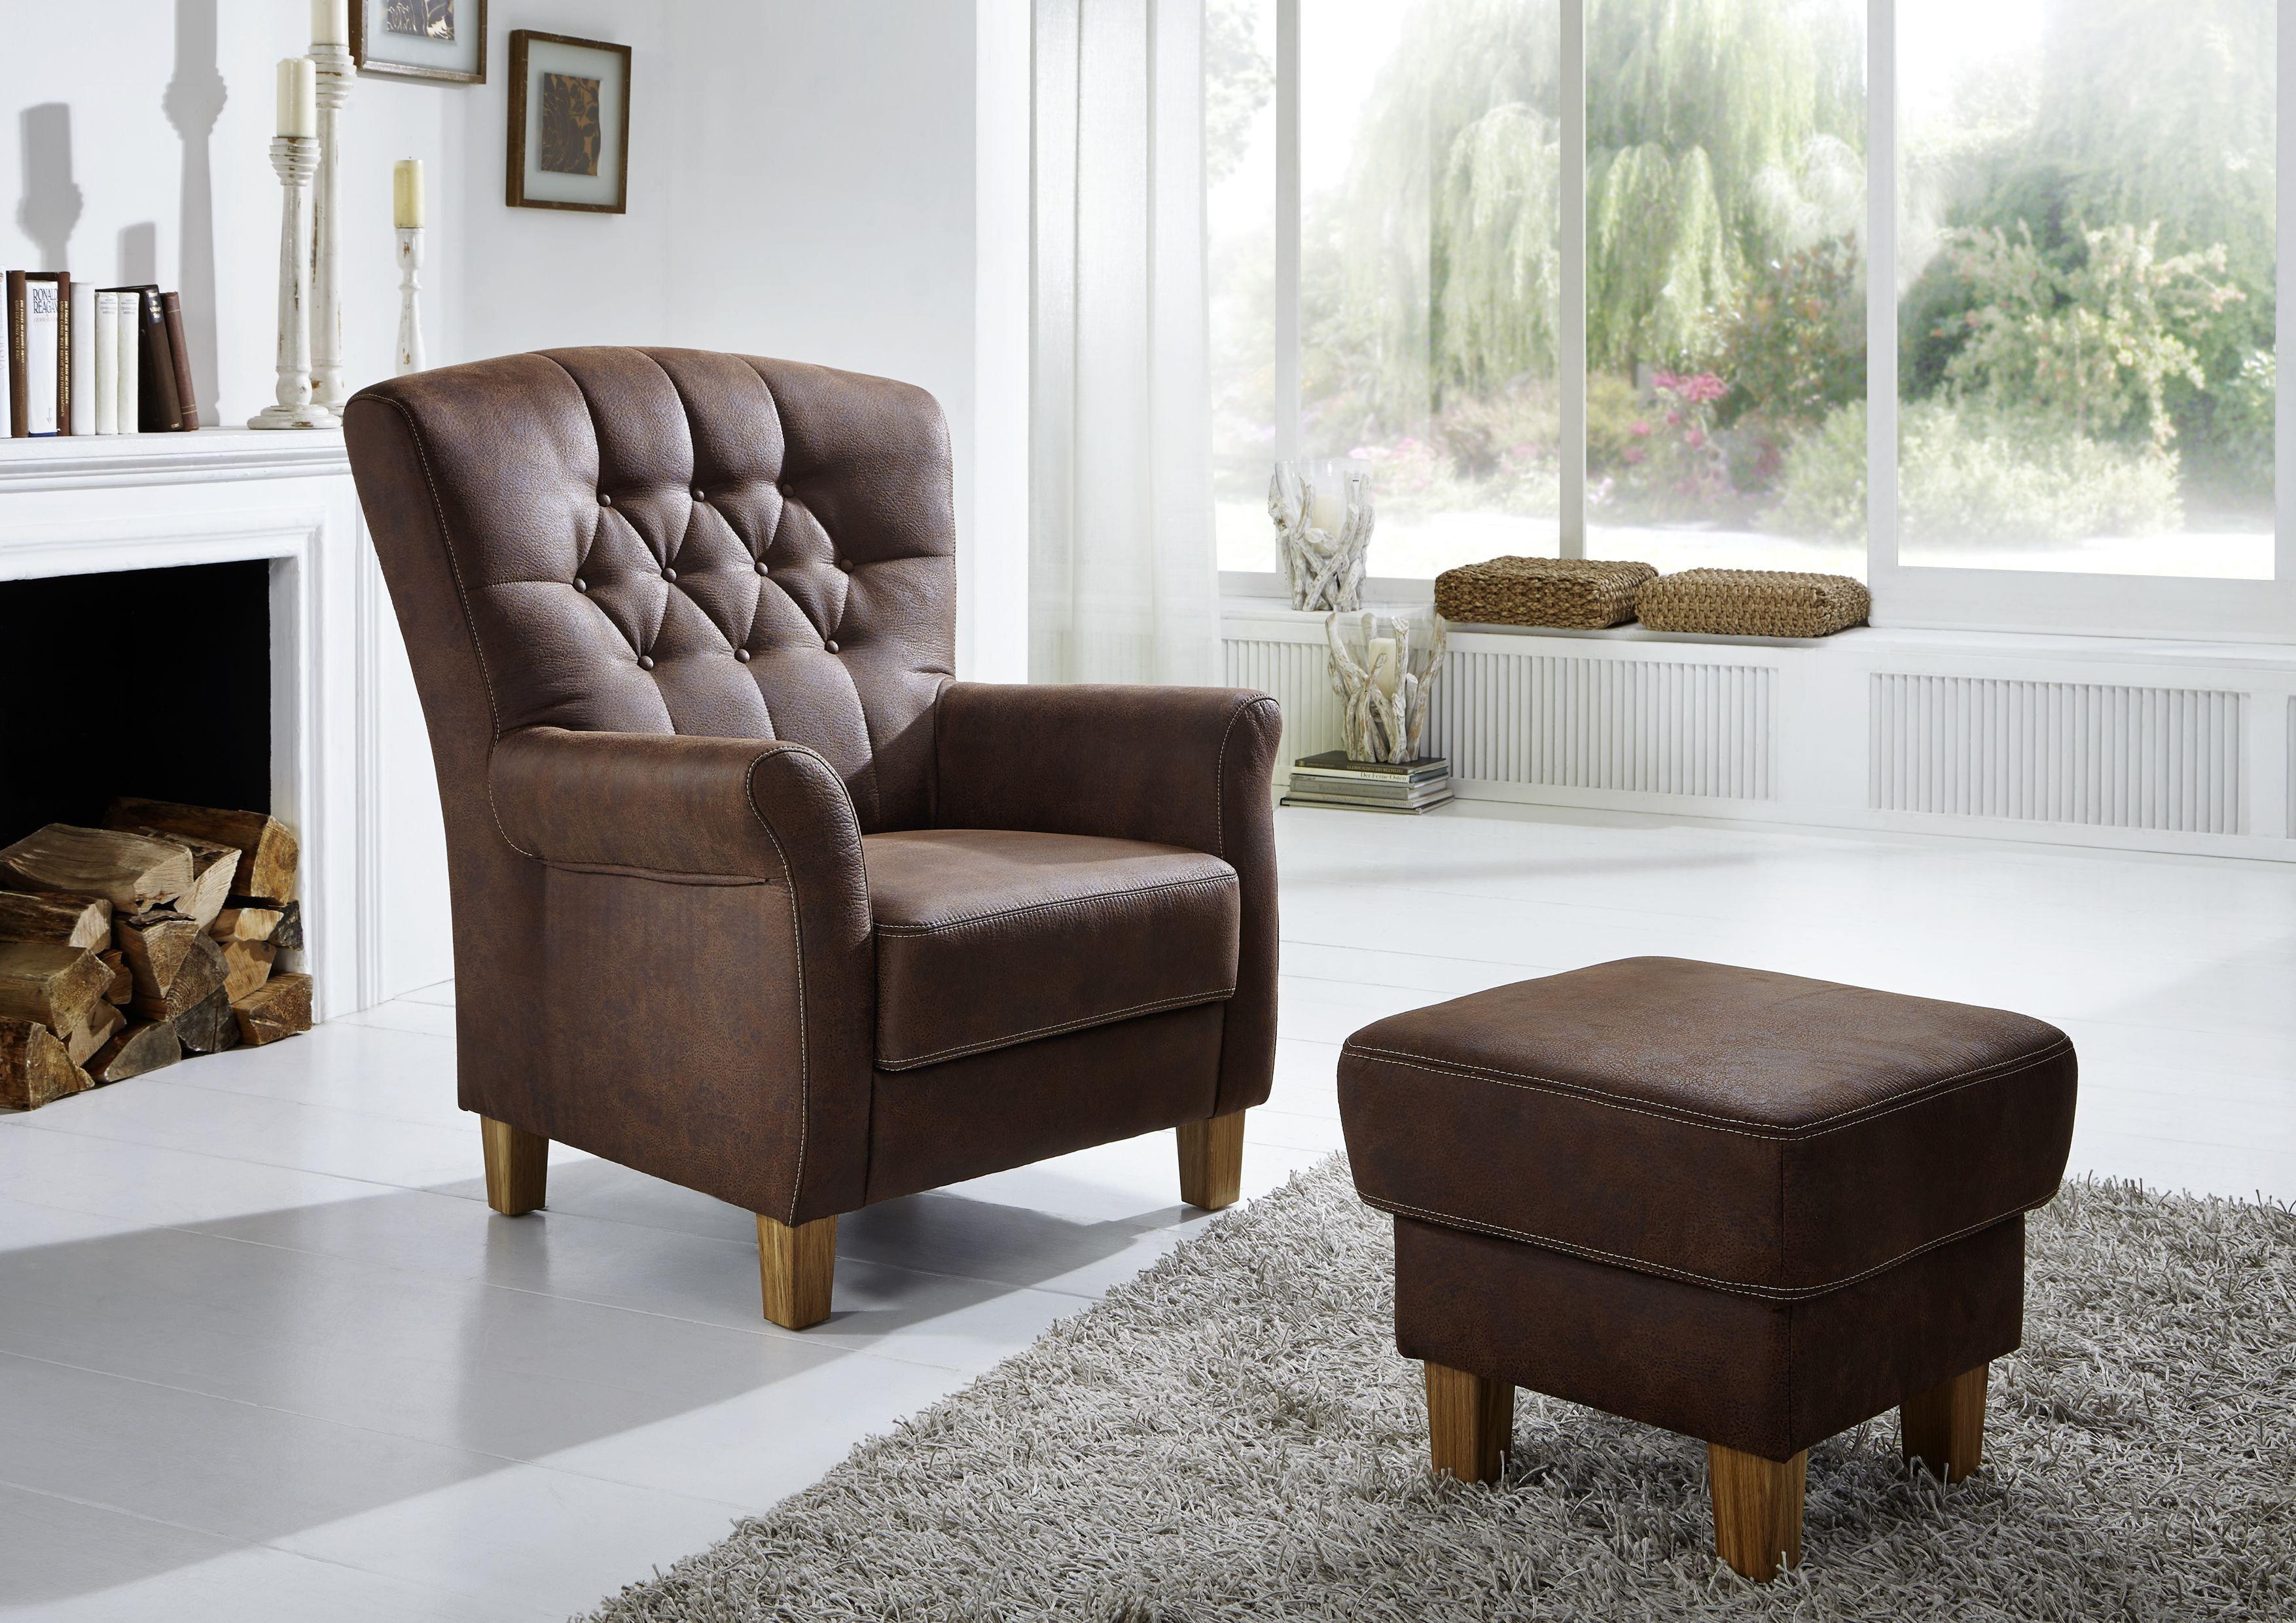 f s polsterm bel 753 hochlehnsessel in braun m bel letz ihr online shop. Black Bedroom Furniture Sets. Home Design Ideas